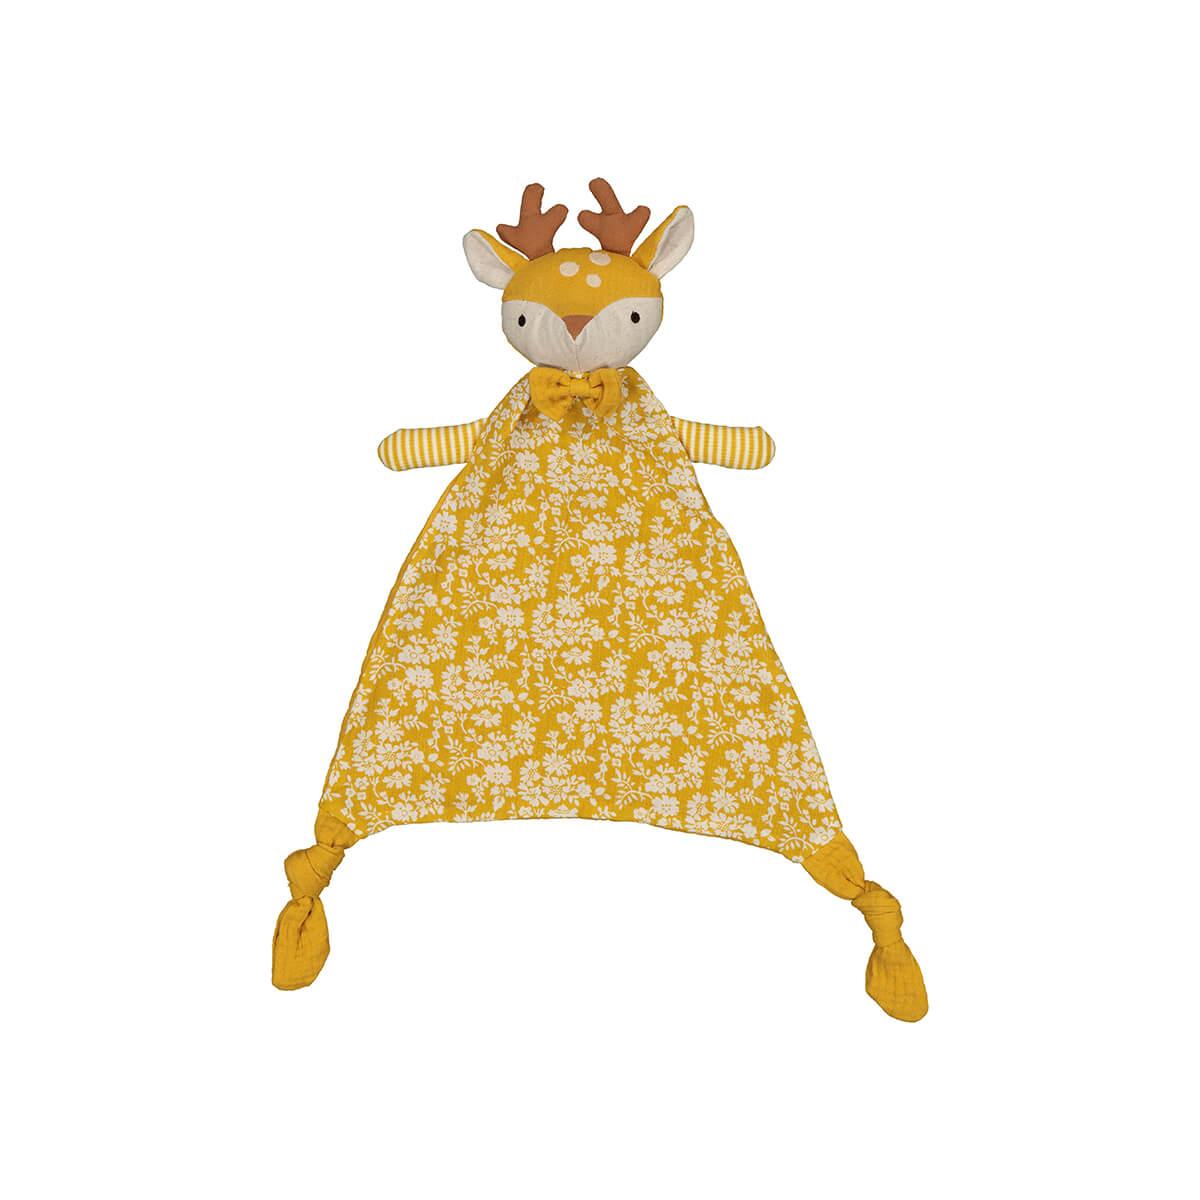 Flat Lay photography soft toys, yellow animal